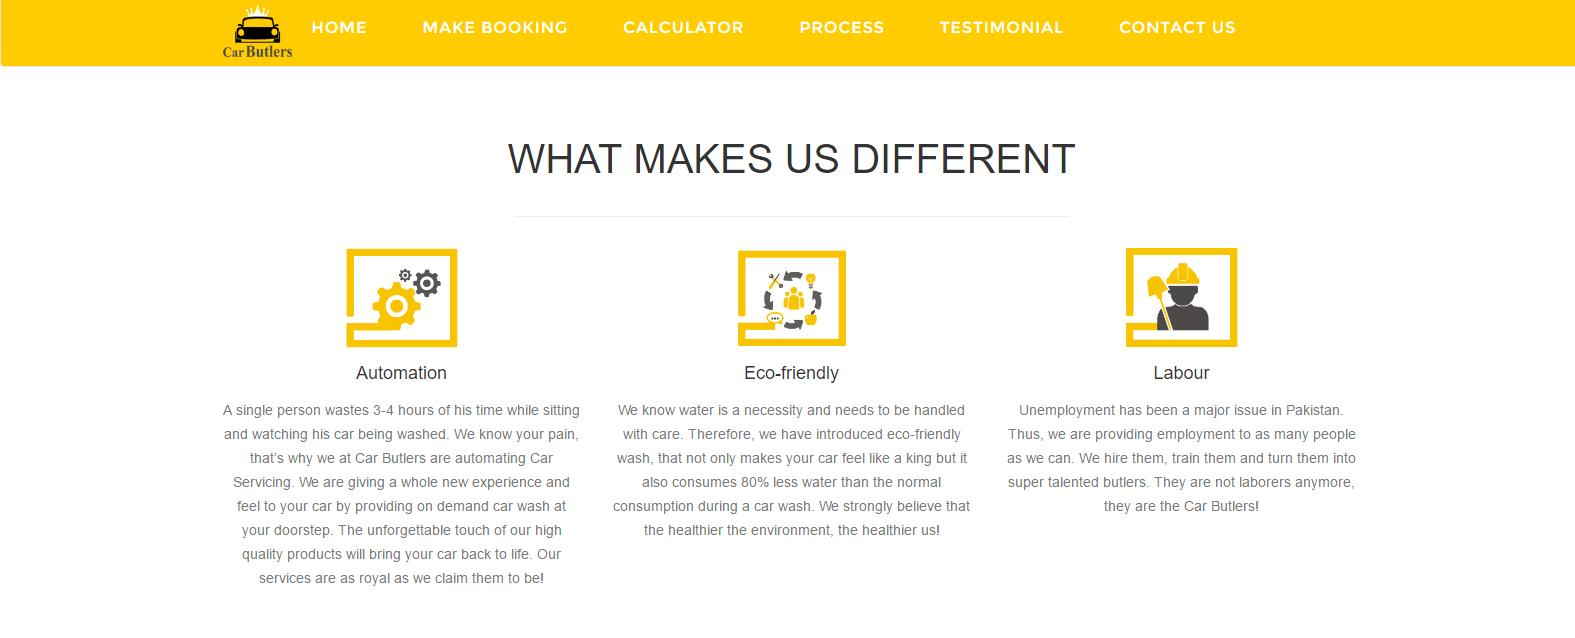 car-butlers-difference-freshstartpk-onlinepr-startups-khawajamubasharmansoor